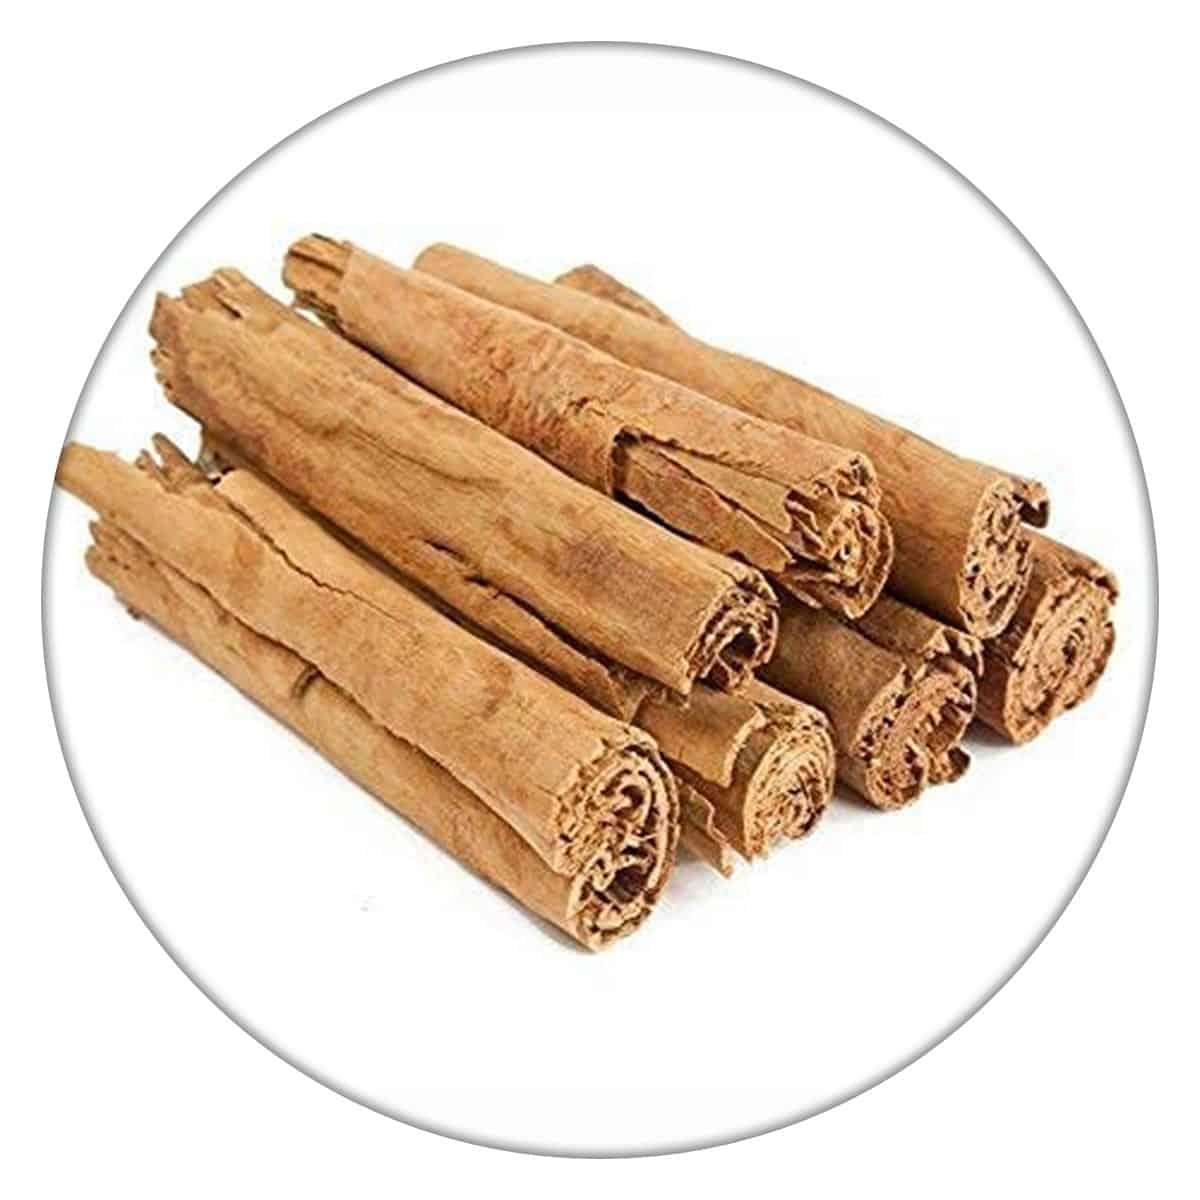 Buy IAG Foods Cinnamon Roll (Soft / Ceylon / True Cinnamon) - 1 kg